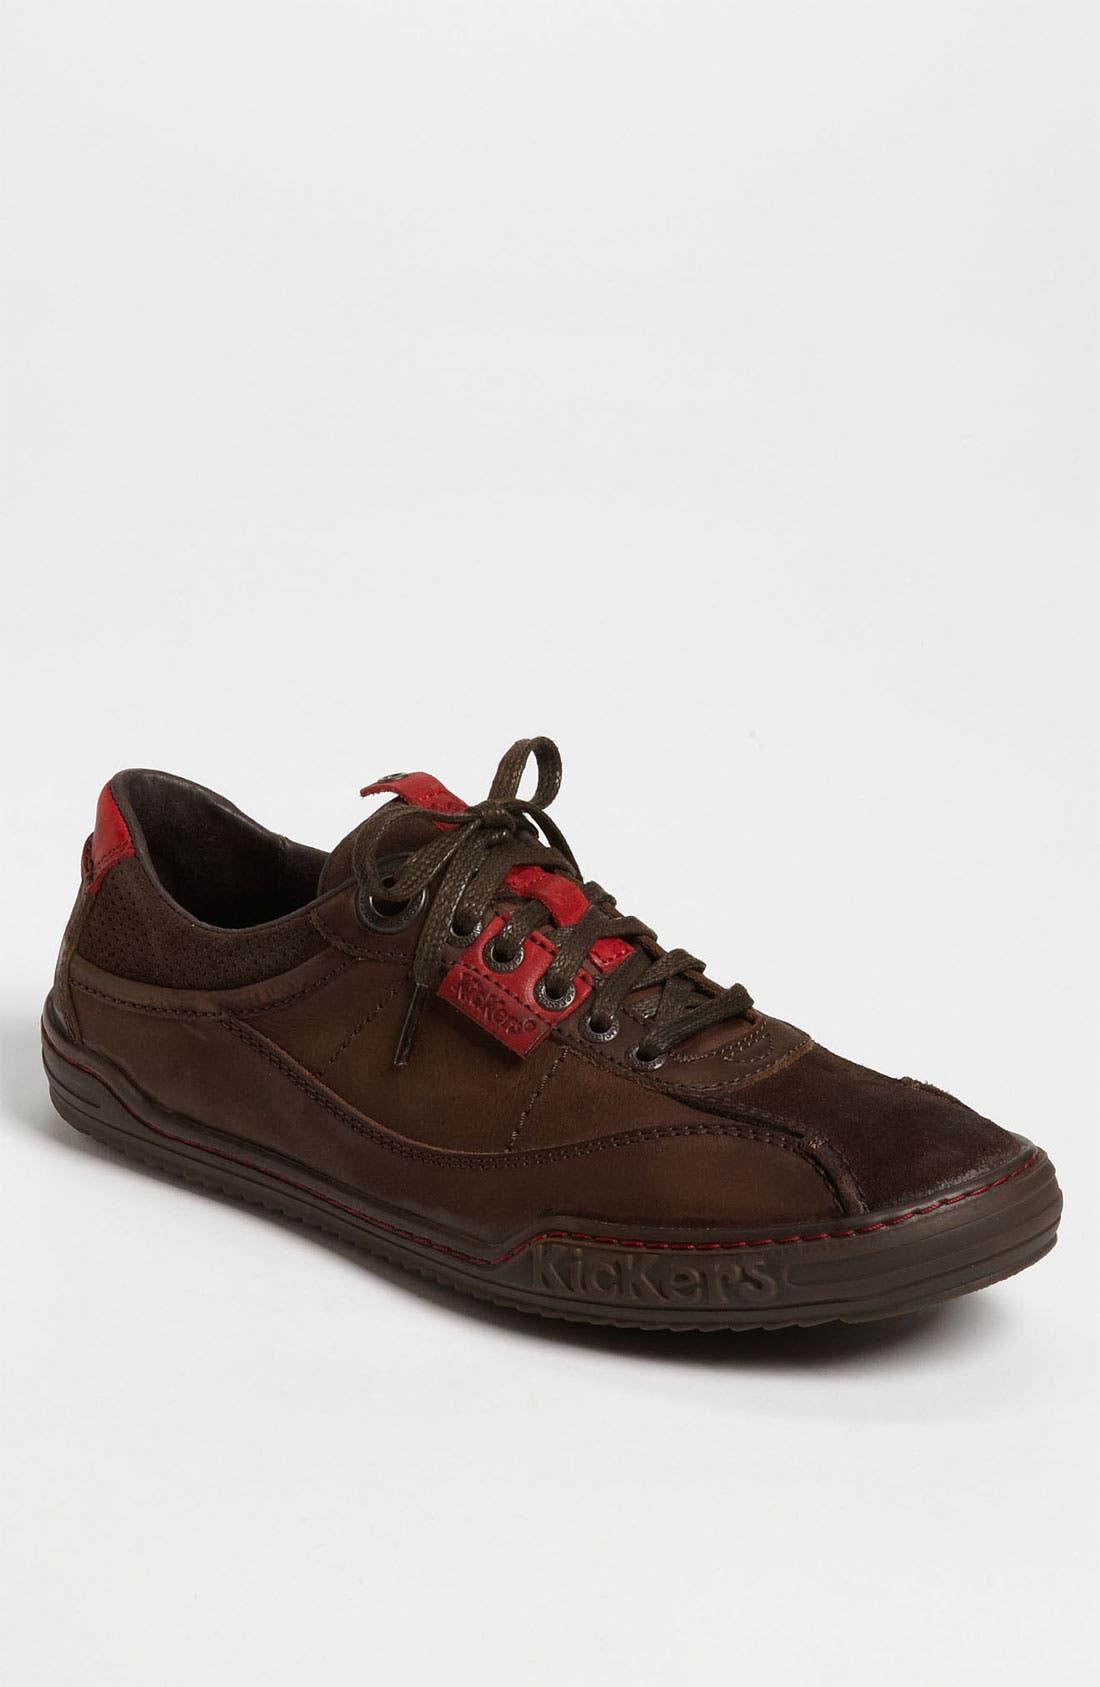 Main Image - Kickers 'Jinial' Sneaker